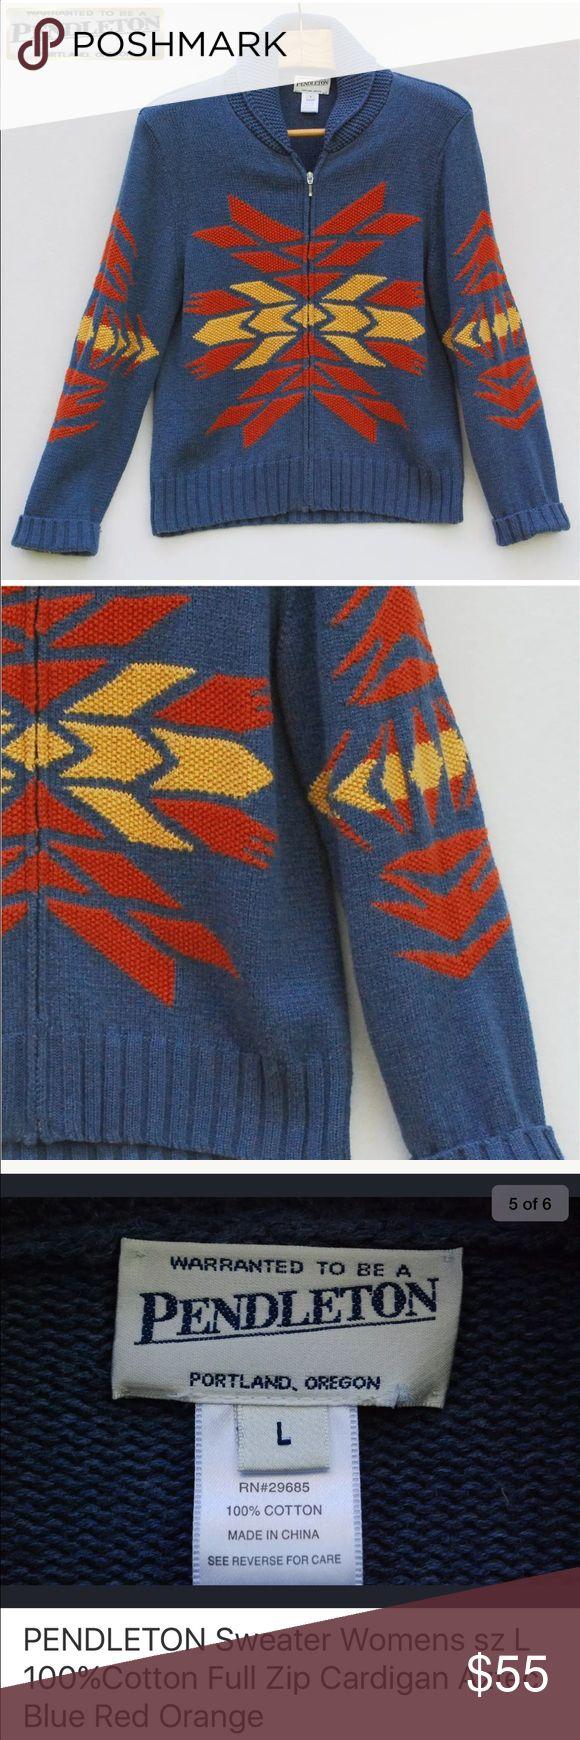 PENDLETON- Aztec sweater//large/ 💯 % Cotton Very warm and cozy Pendleton zip up cotton sweater. Aztec design. Size Large Pendleton Sweaters Cardigans